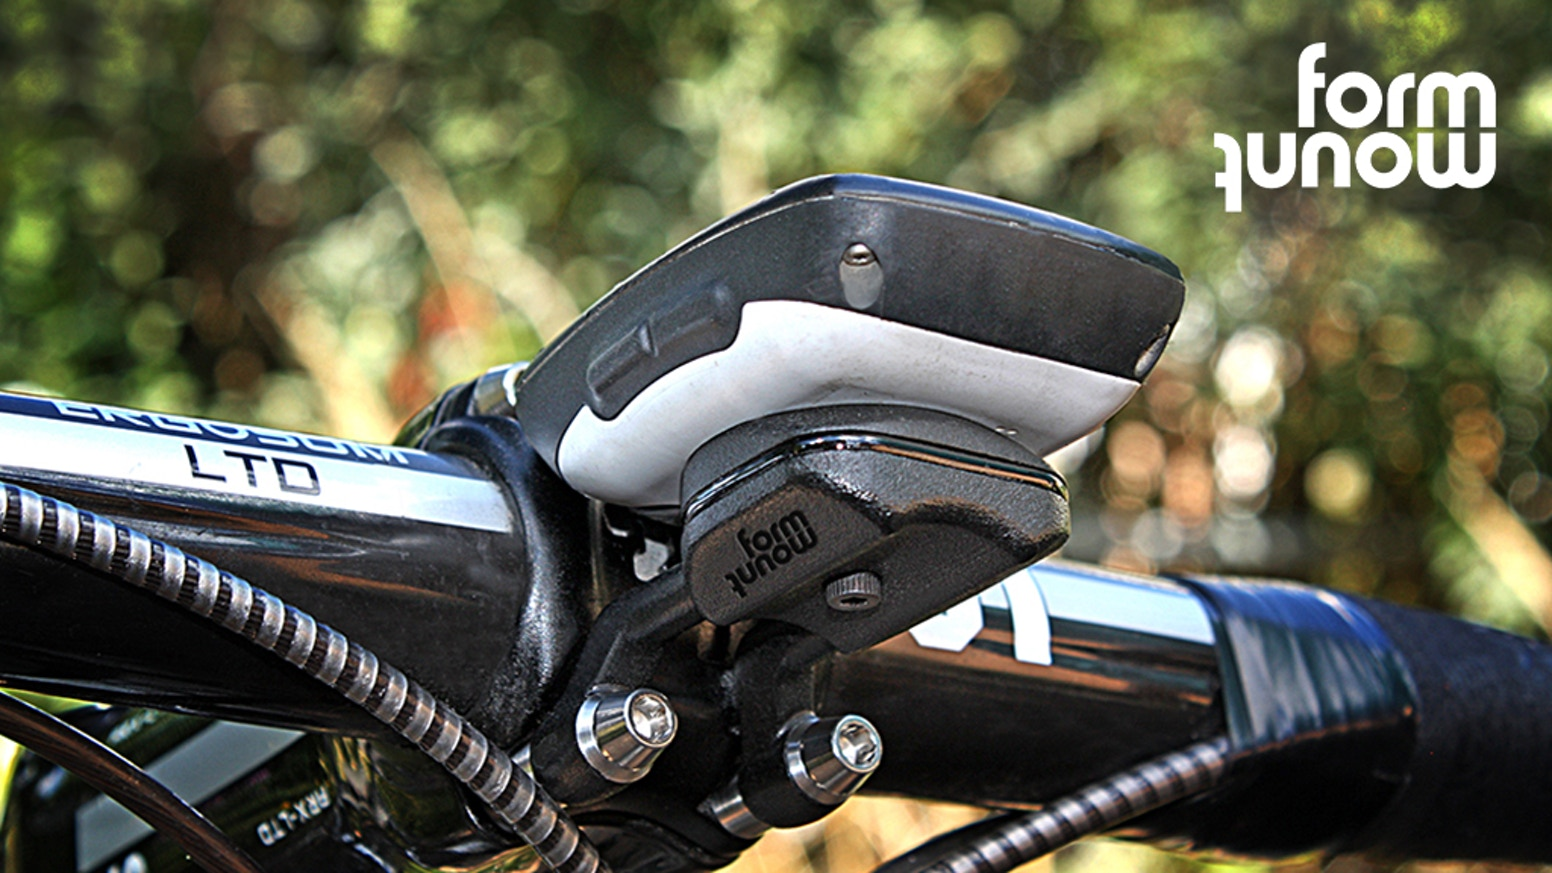 Formmount Direct Stem Bike Computer Mount For Gps Amp Phone